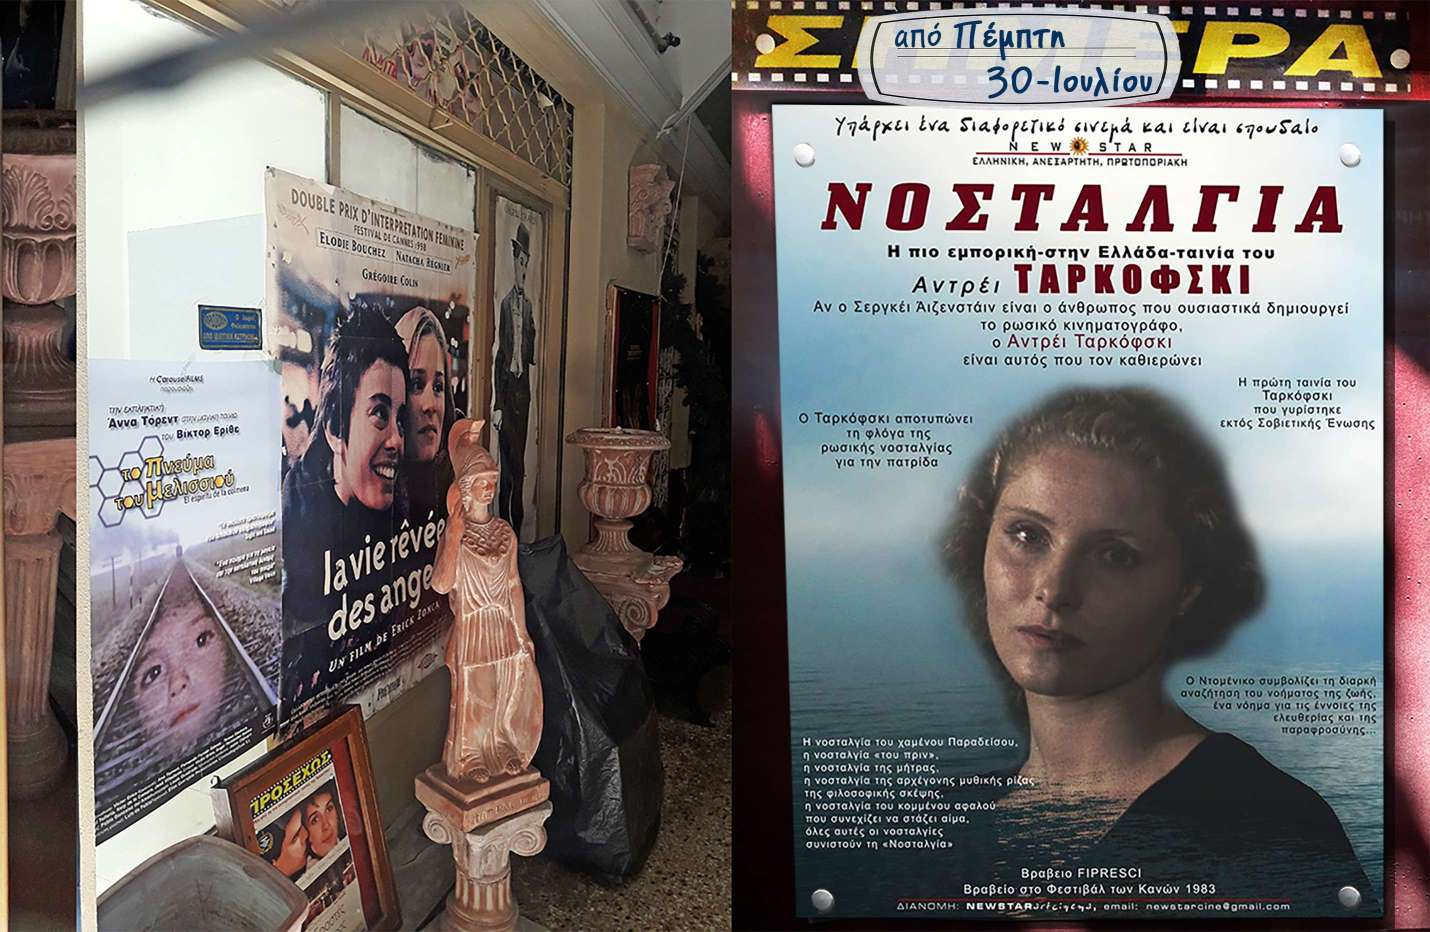 Nostalghia «Νοσταλγία» Αντρέι Ταρκόφσκι σινε ΟΑΣΙΣ